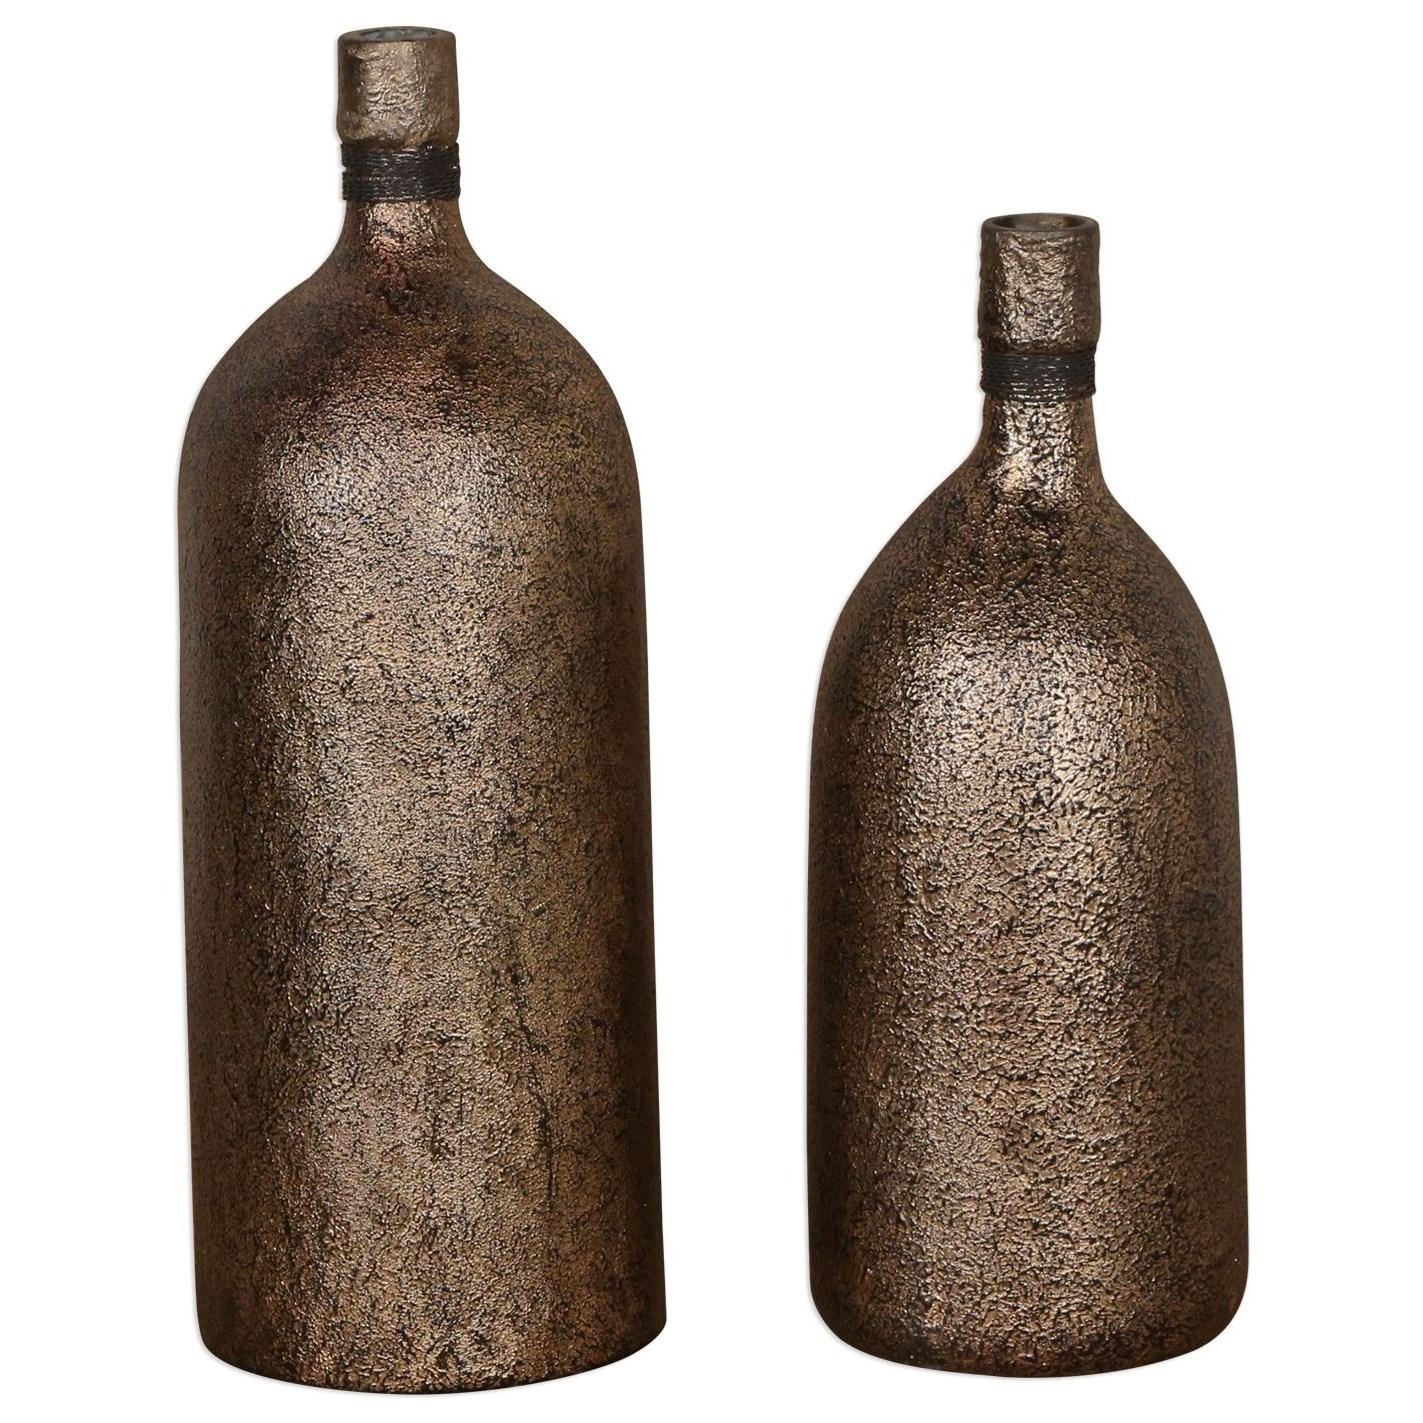 Biren Textured Antiqued Gold Vases Set of 2